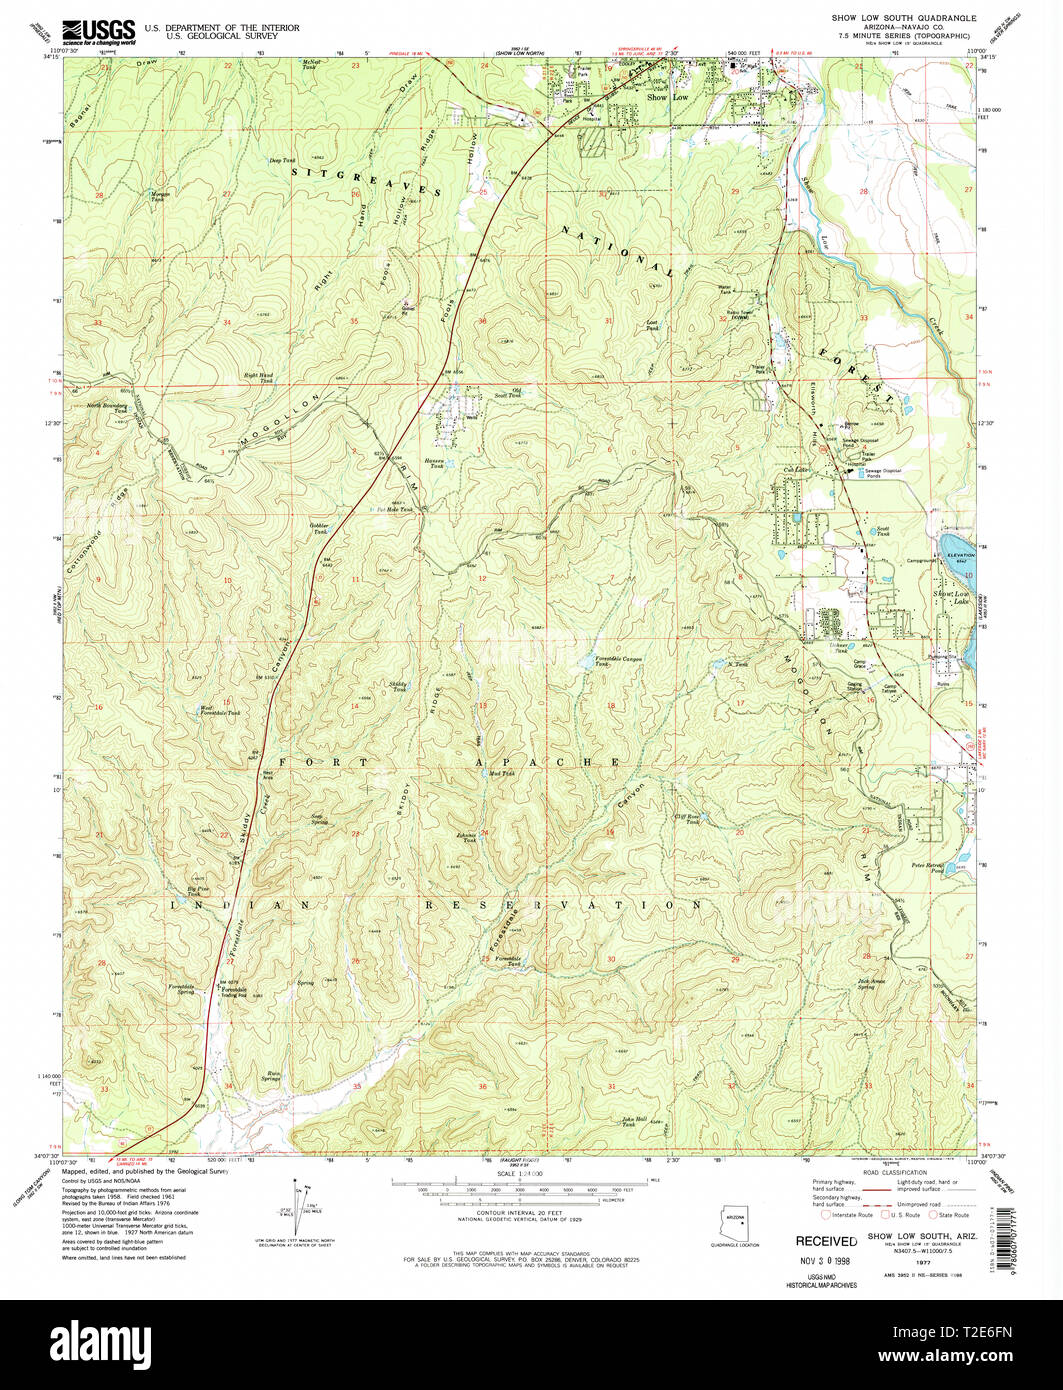 Show Map Of Arizona.Show A Map Of Arizona